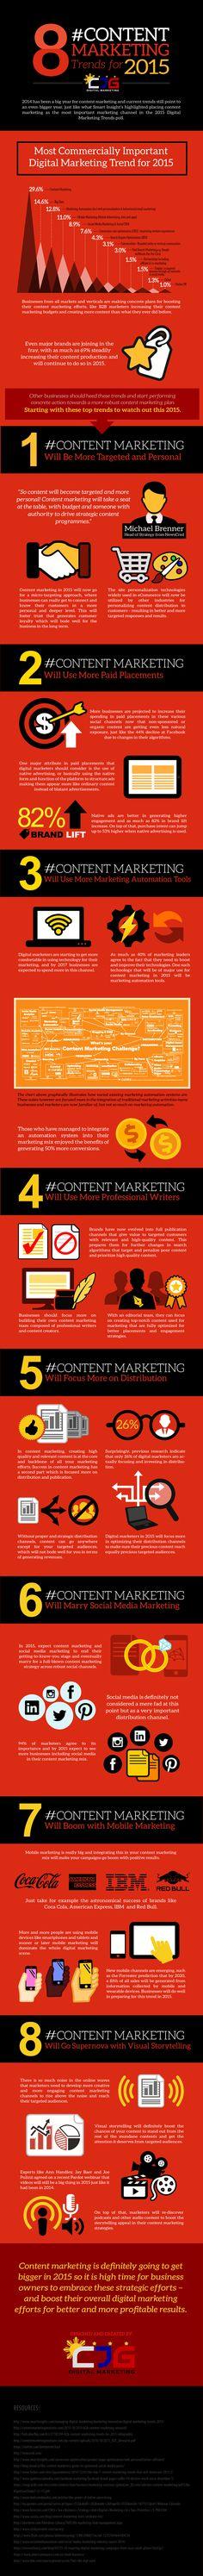 8-tendencias-marketing-contenidos-infografia.jpg (646×8183)